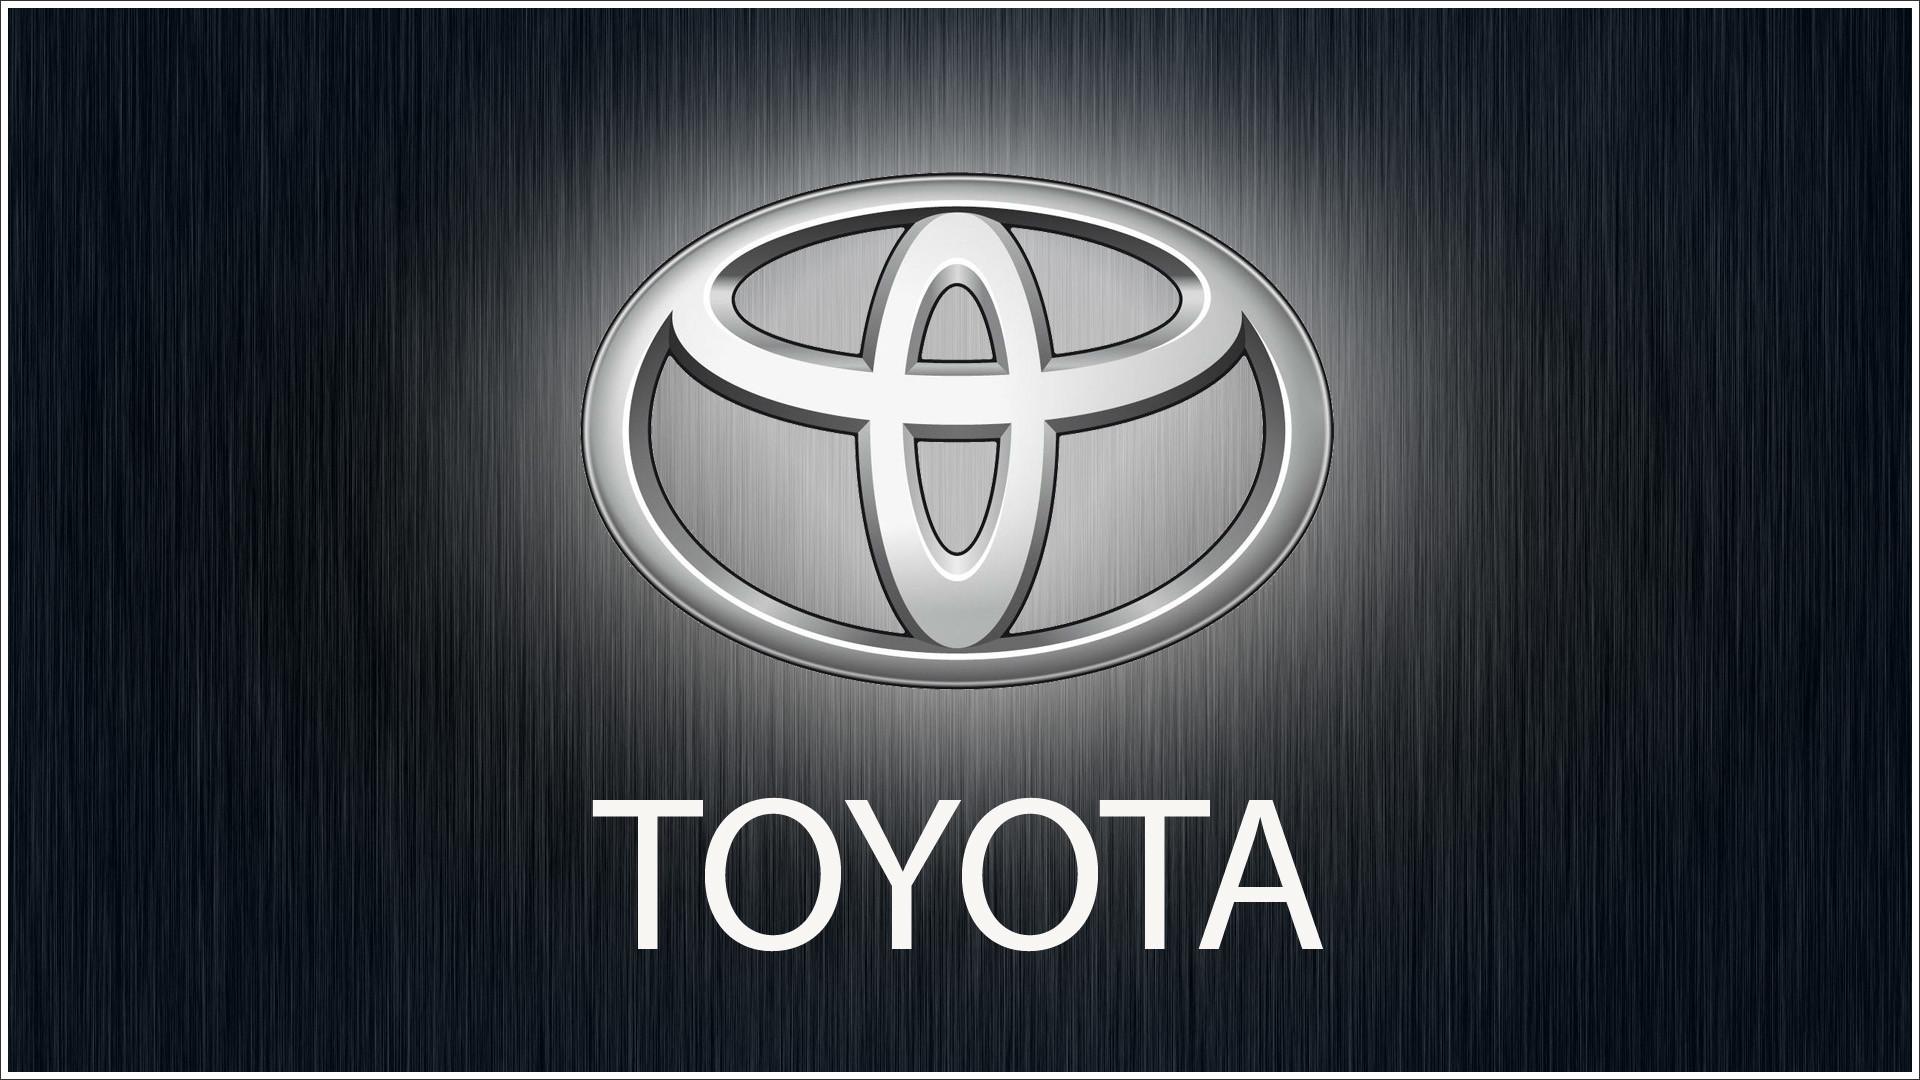 toyota logo wallpaper 55 images